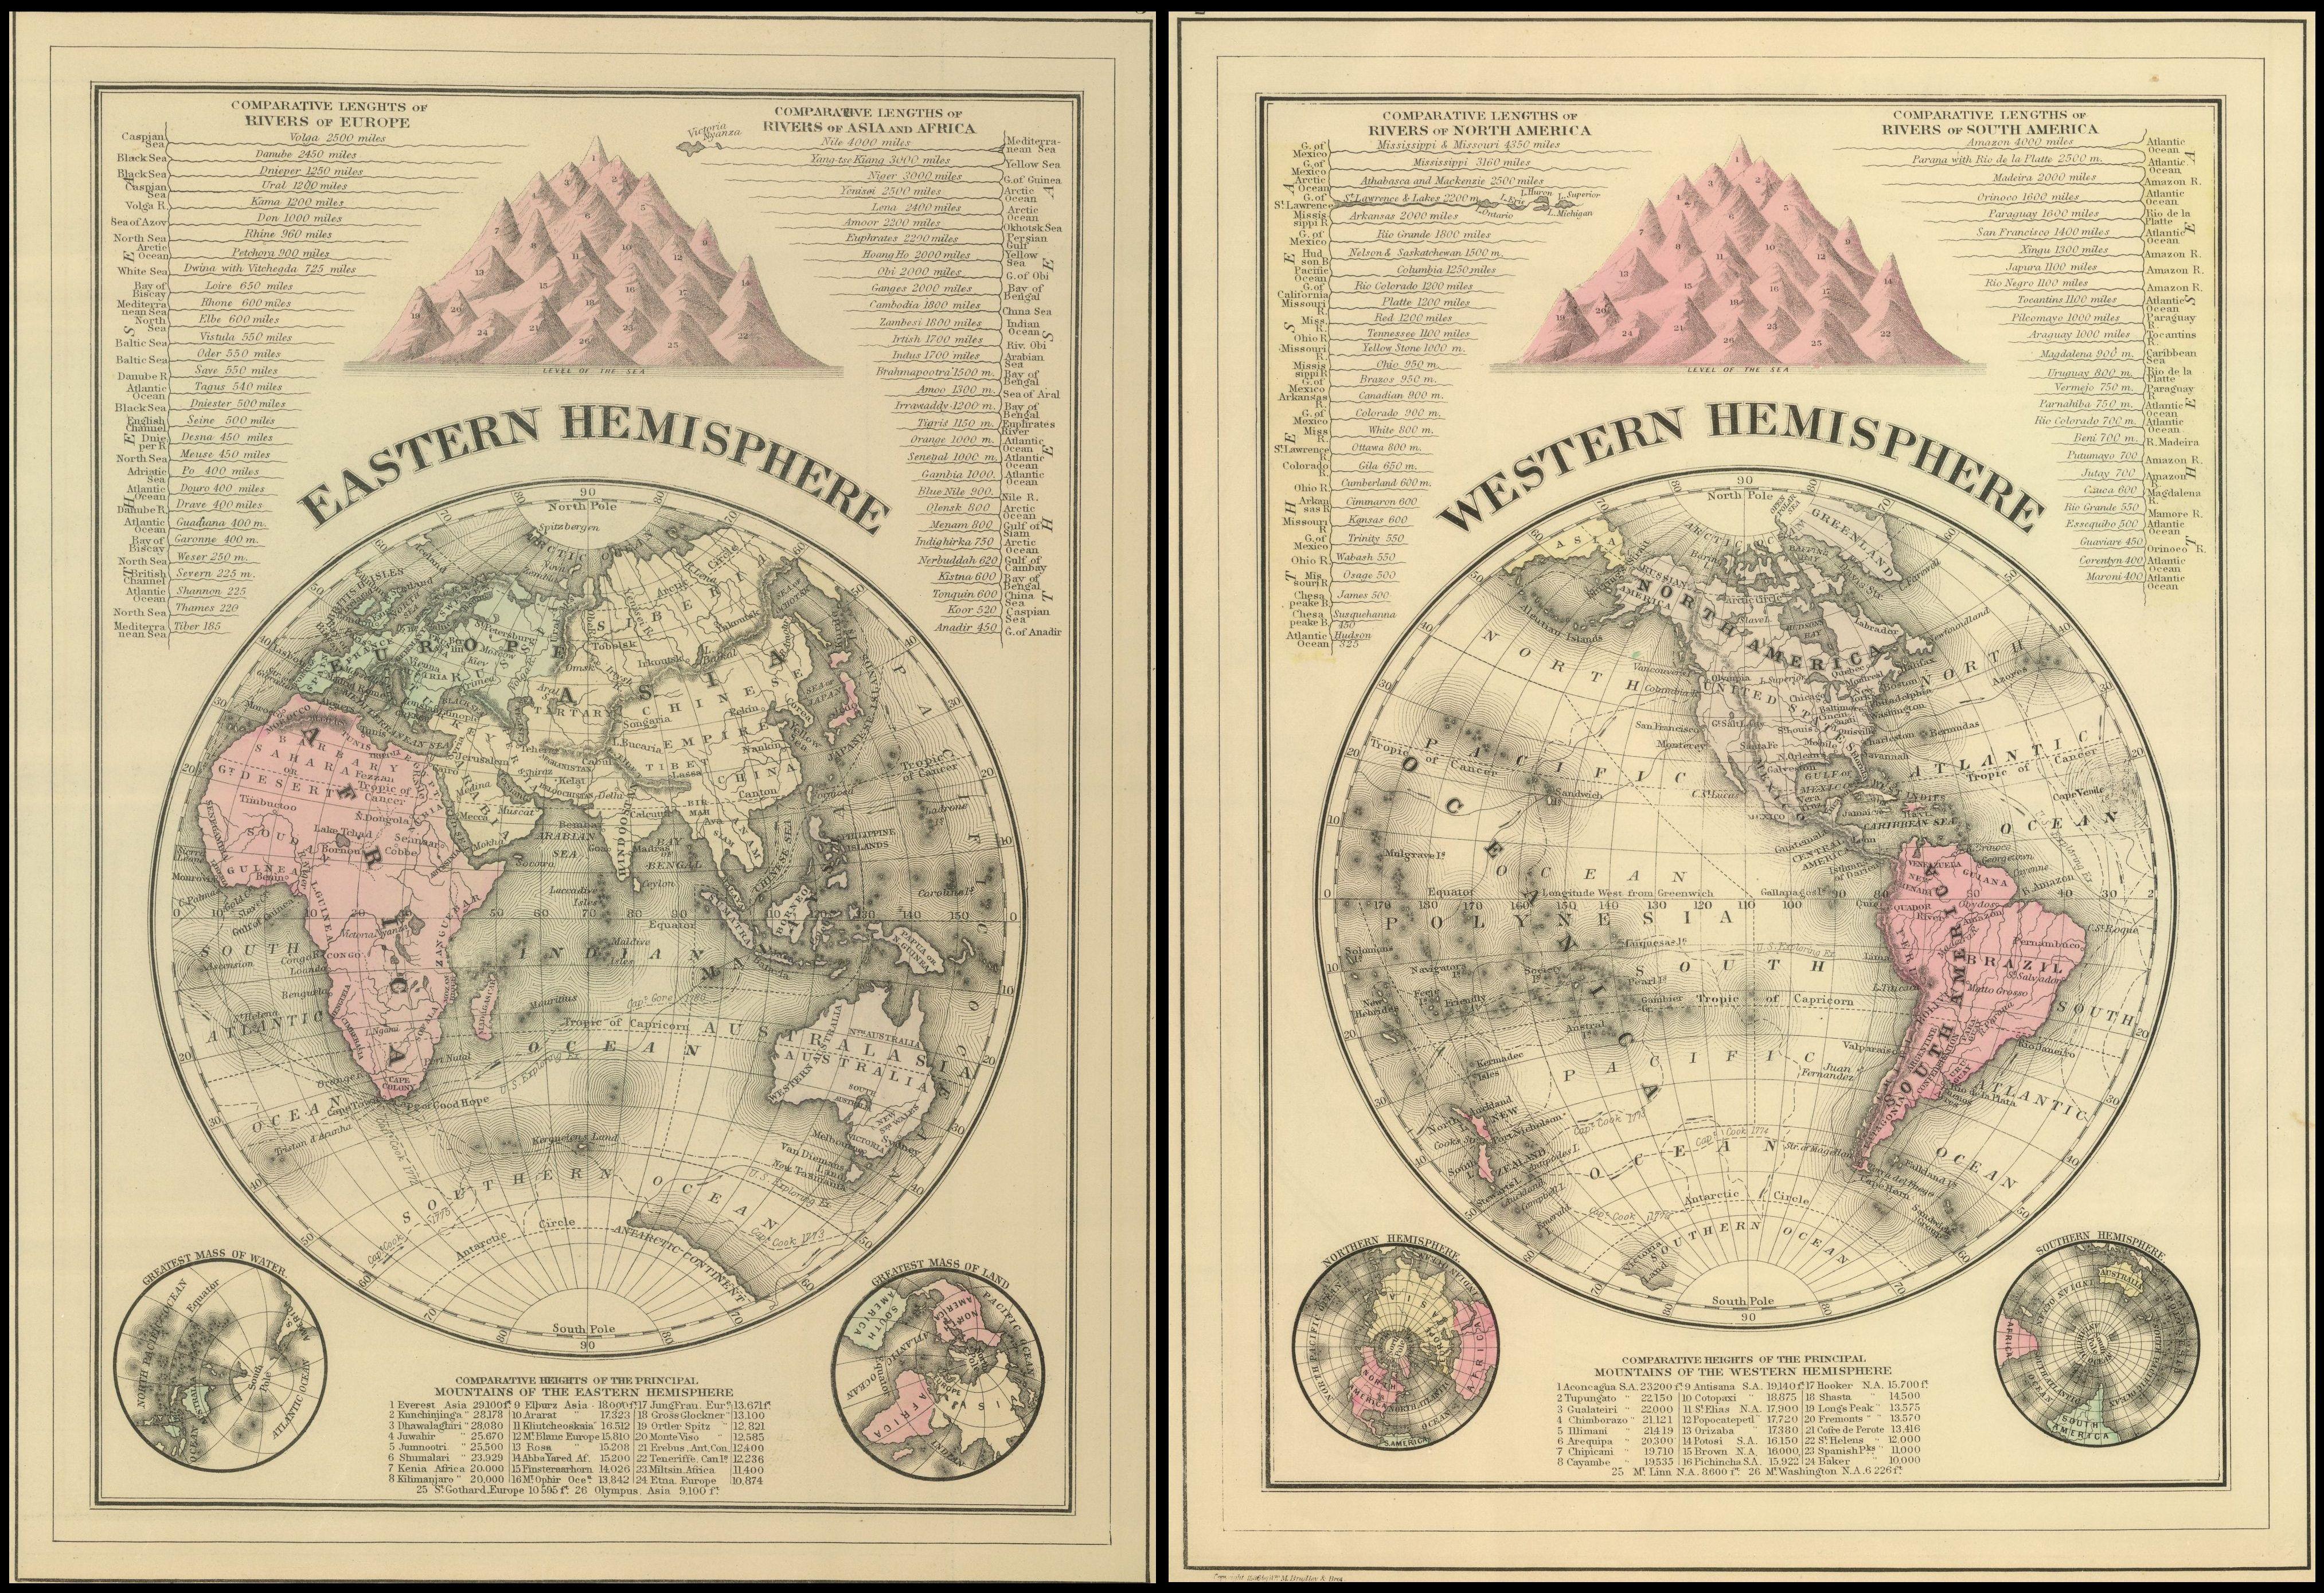 20 free vintage map printable images remodelaholic bloglovin gumiabroncs Image collections